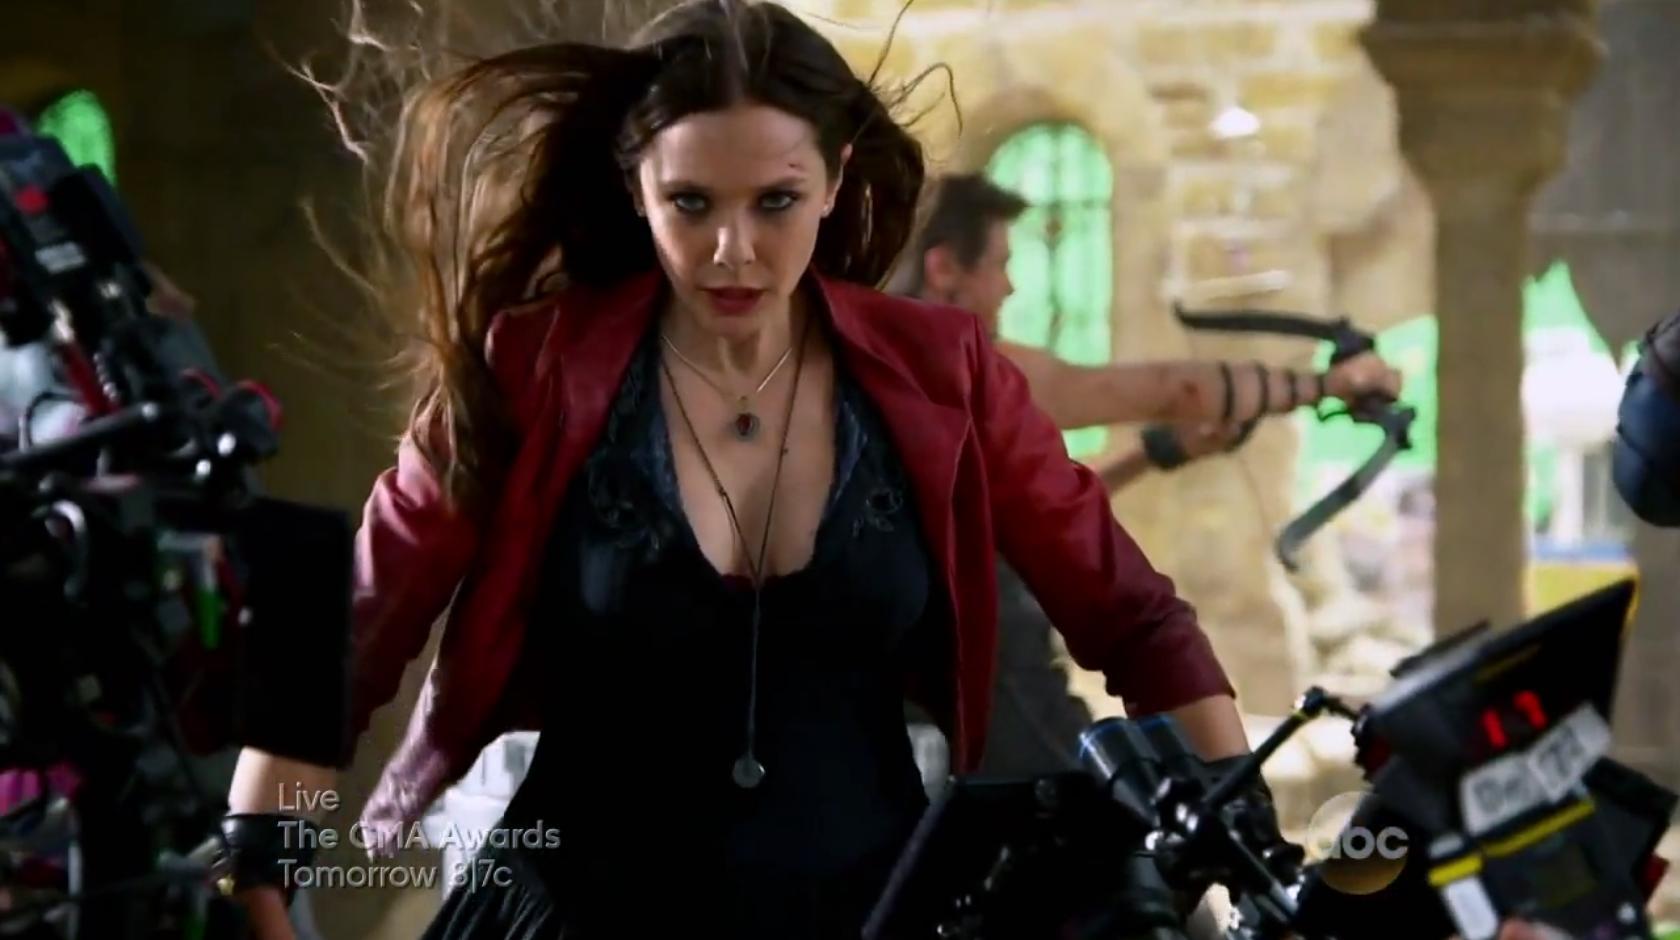 x files scarlet witch